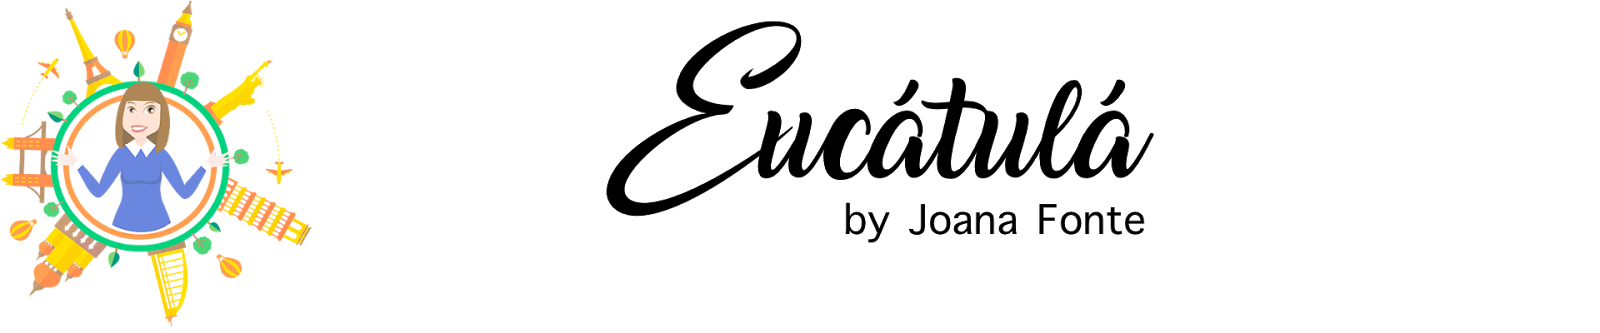 Eucatula